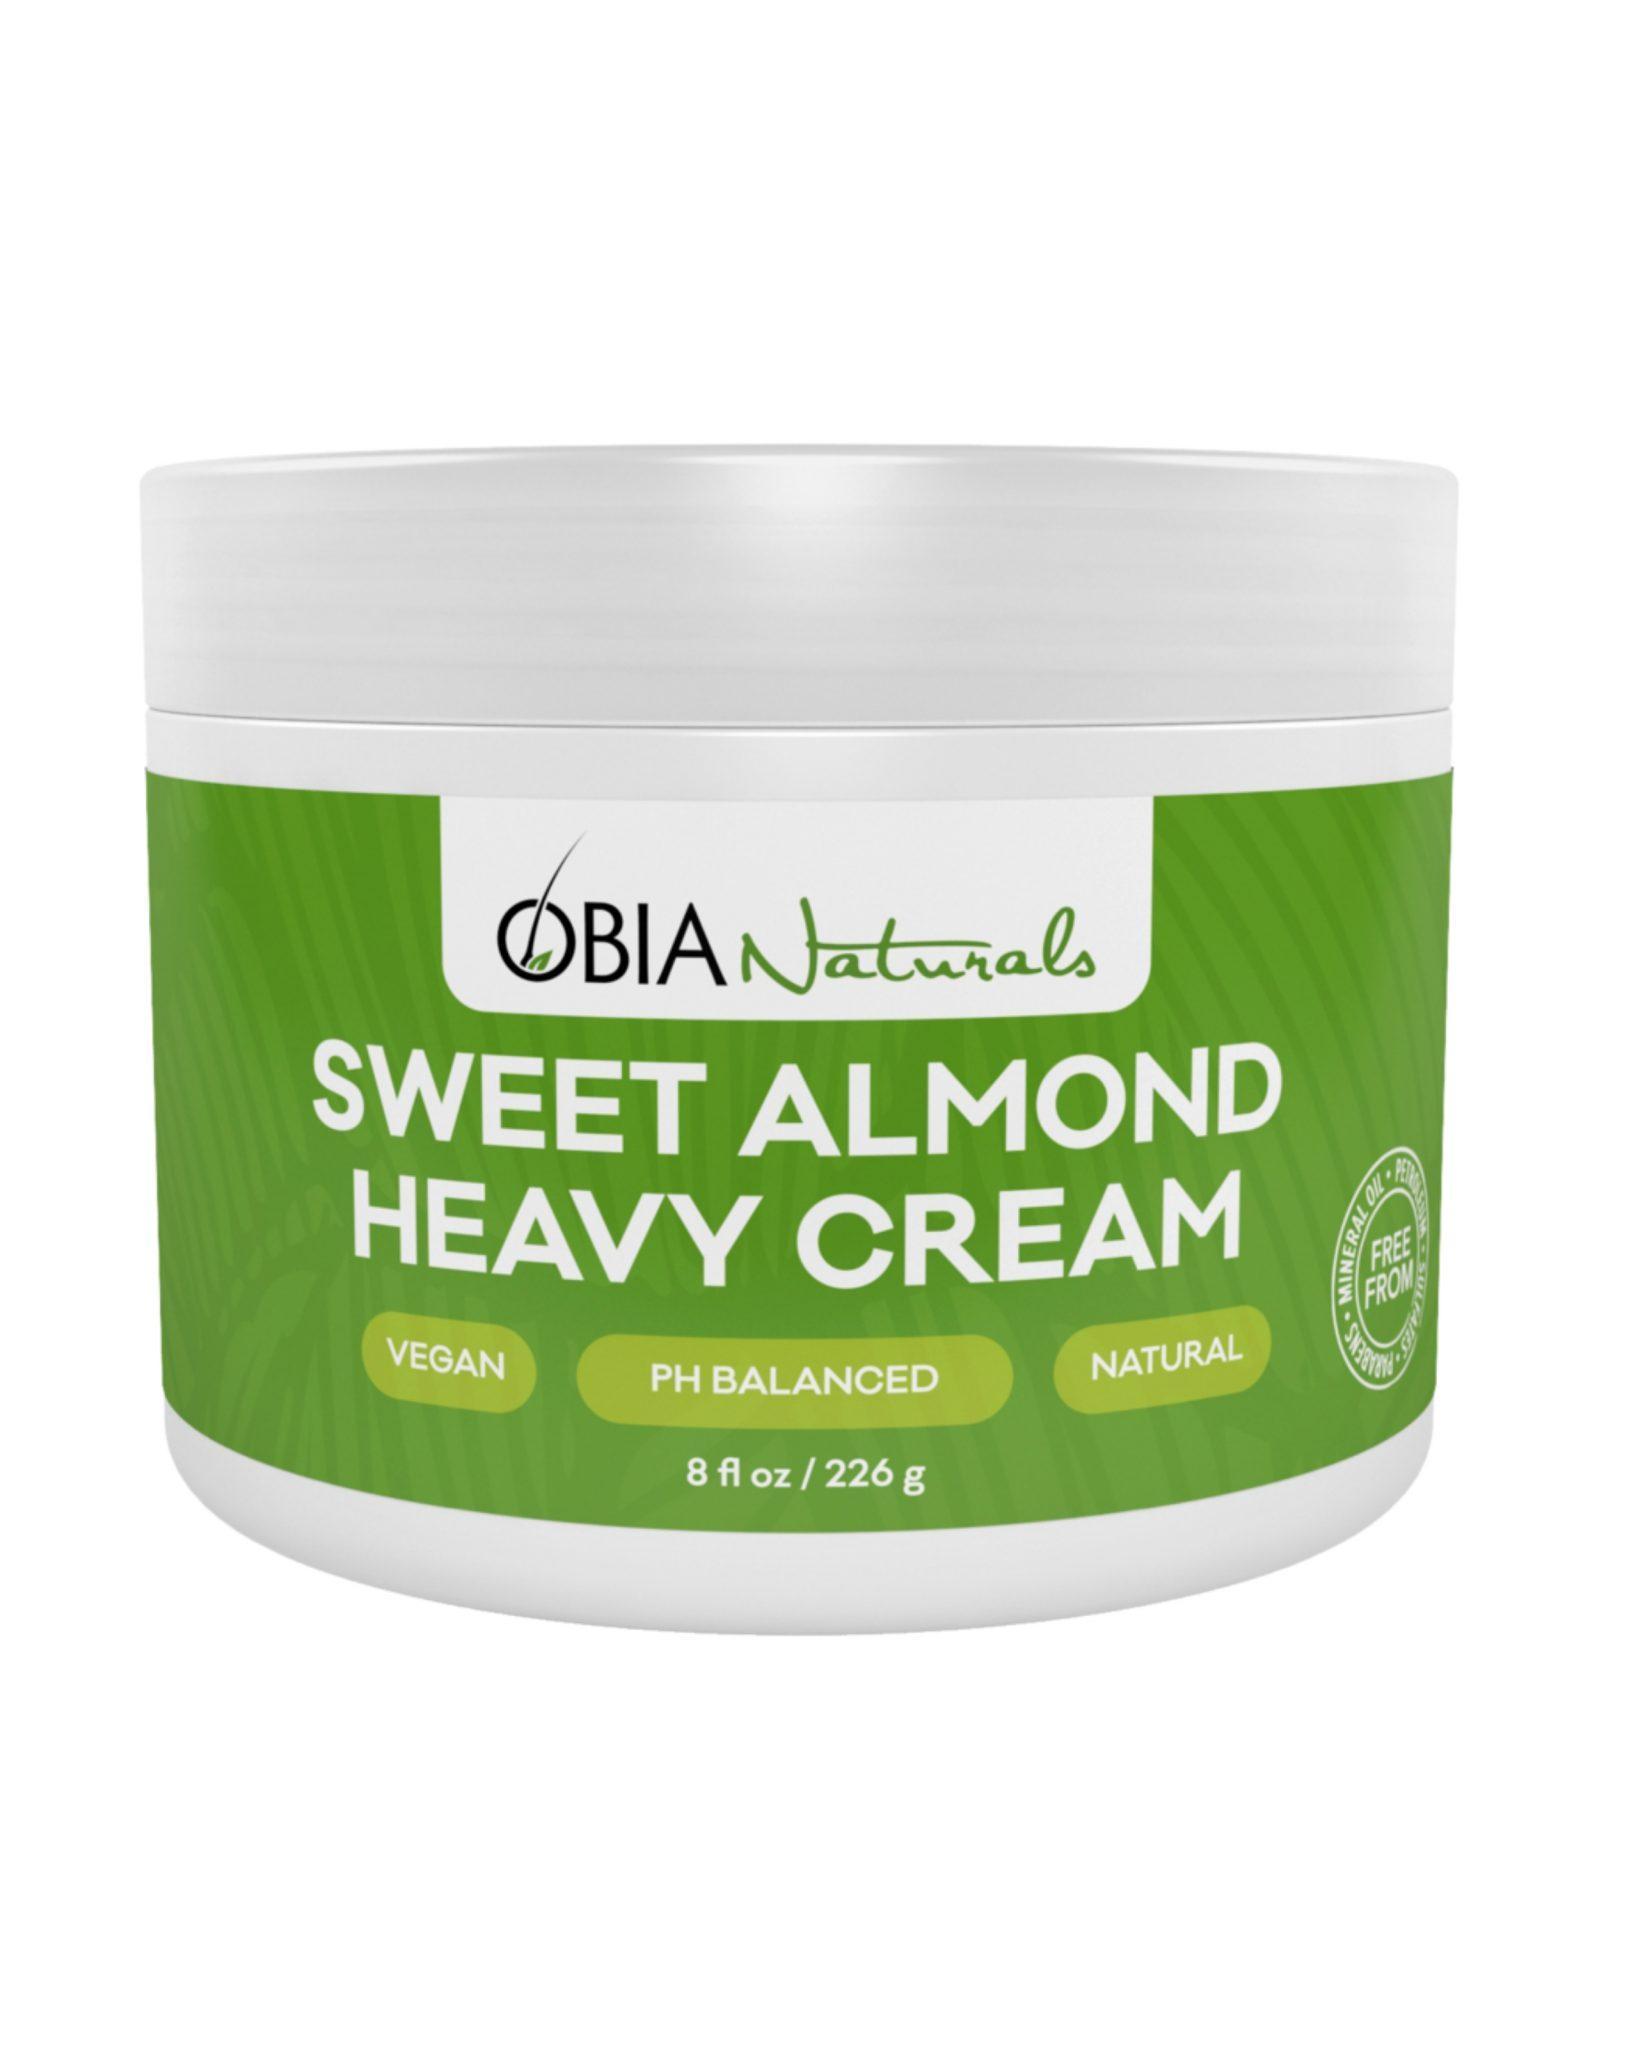 OBIA Naturals Sweet Almond Heavy Cream